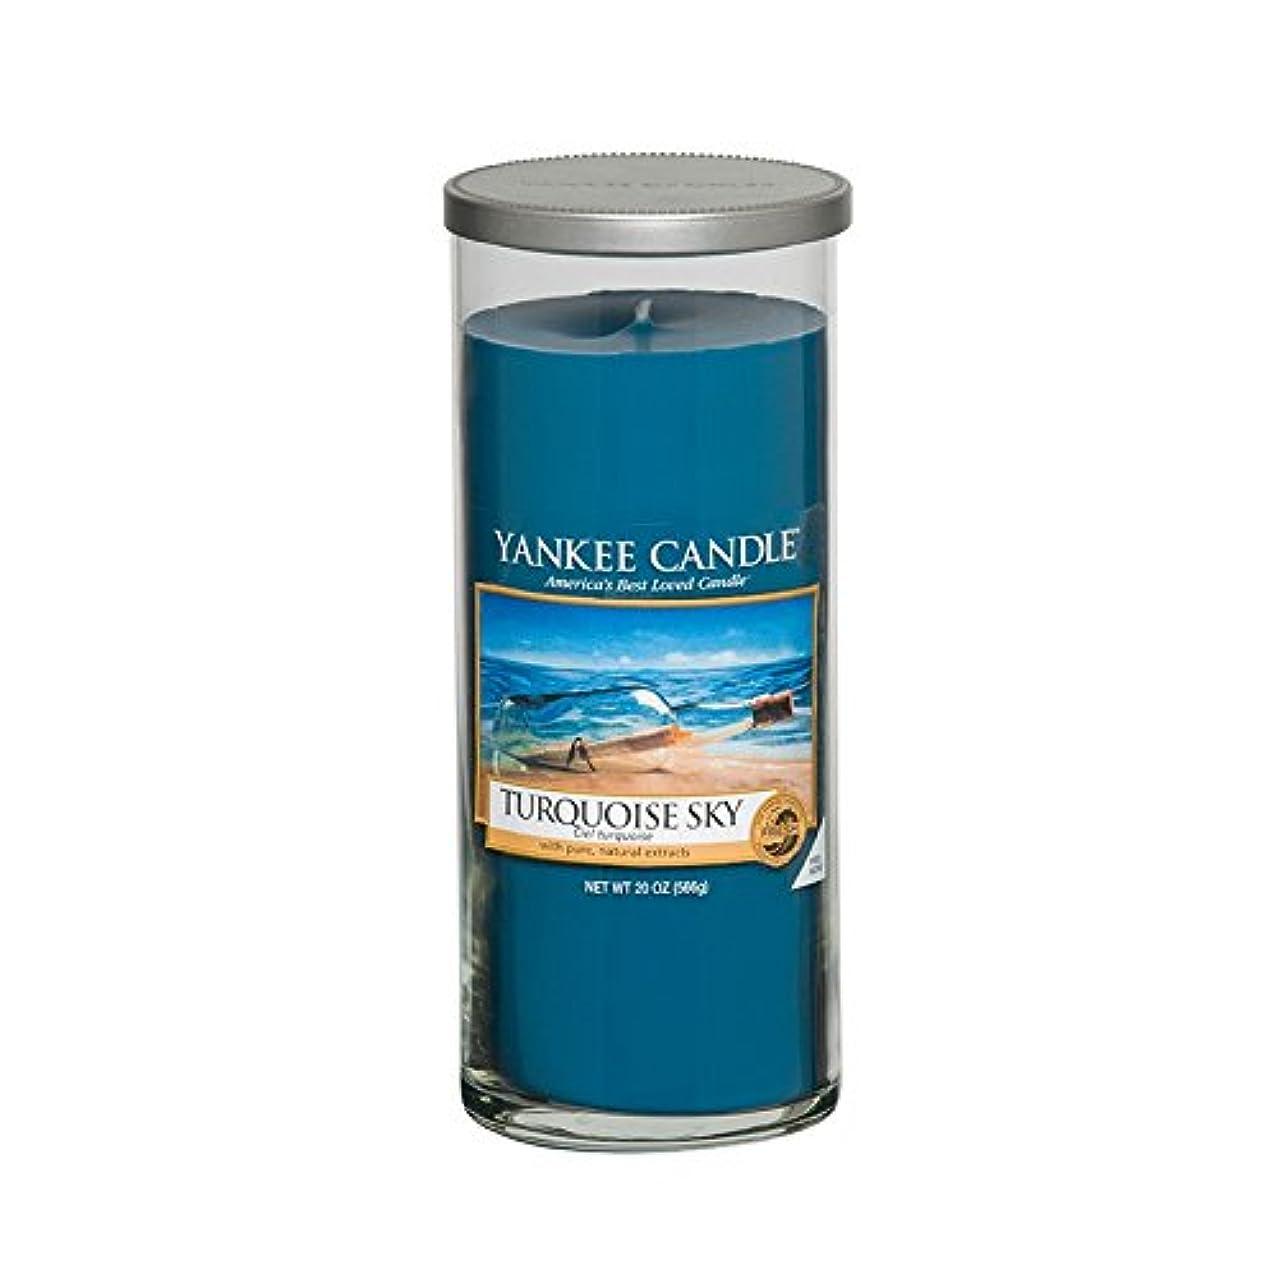 Yankee Candles Large Pillar Candle - Turquoise Sky (Pack of 2) - ヤンキーキャンドル大きな柱キャンドル - ターコイズの空 (x2) [並行輸入品]